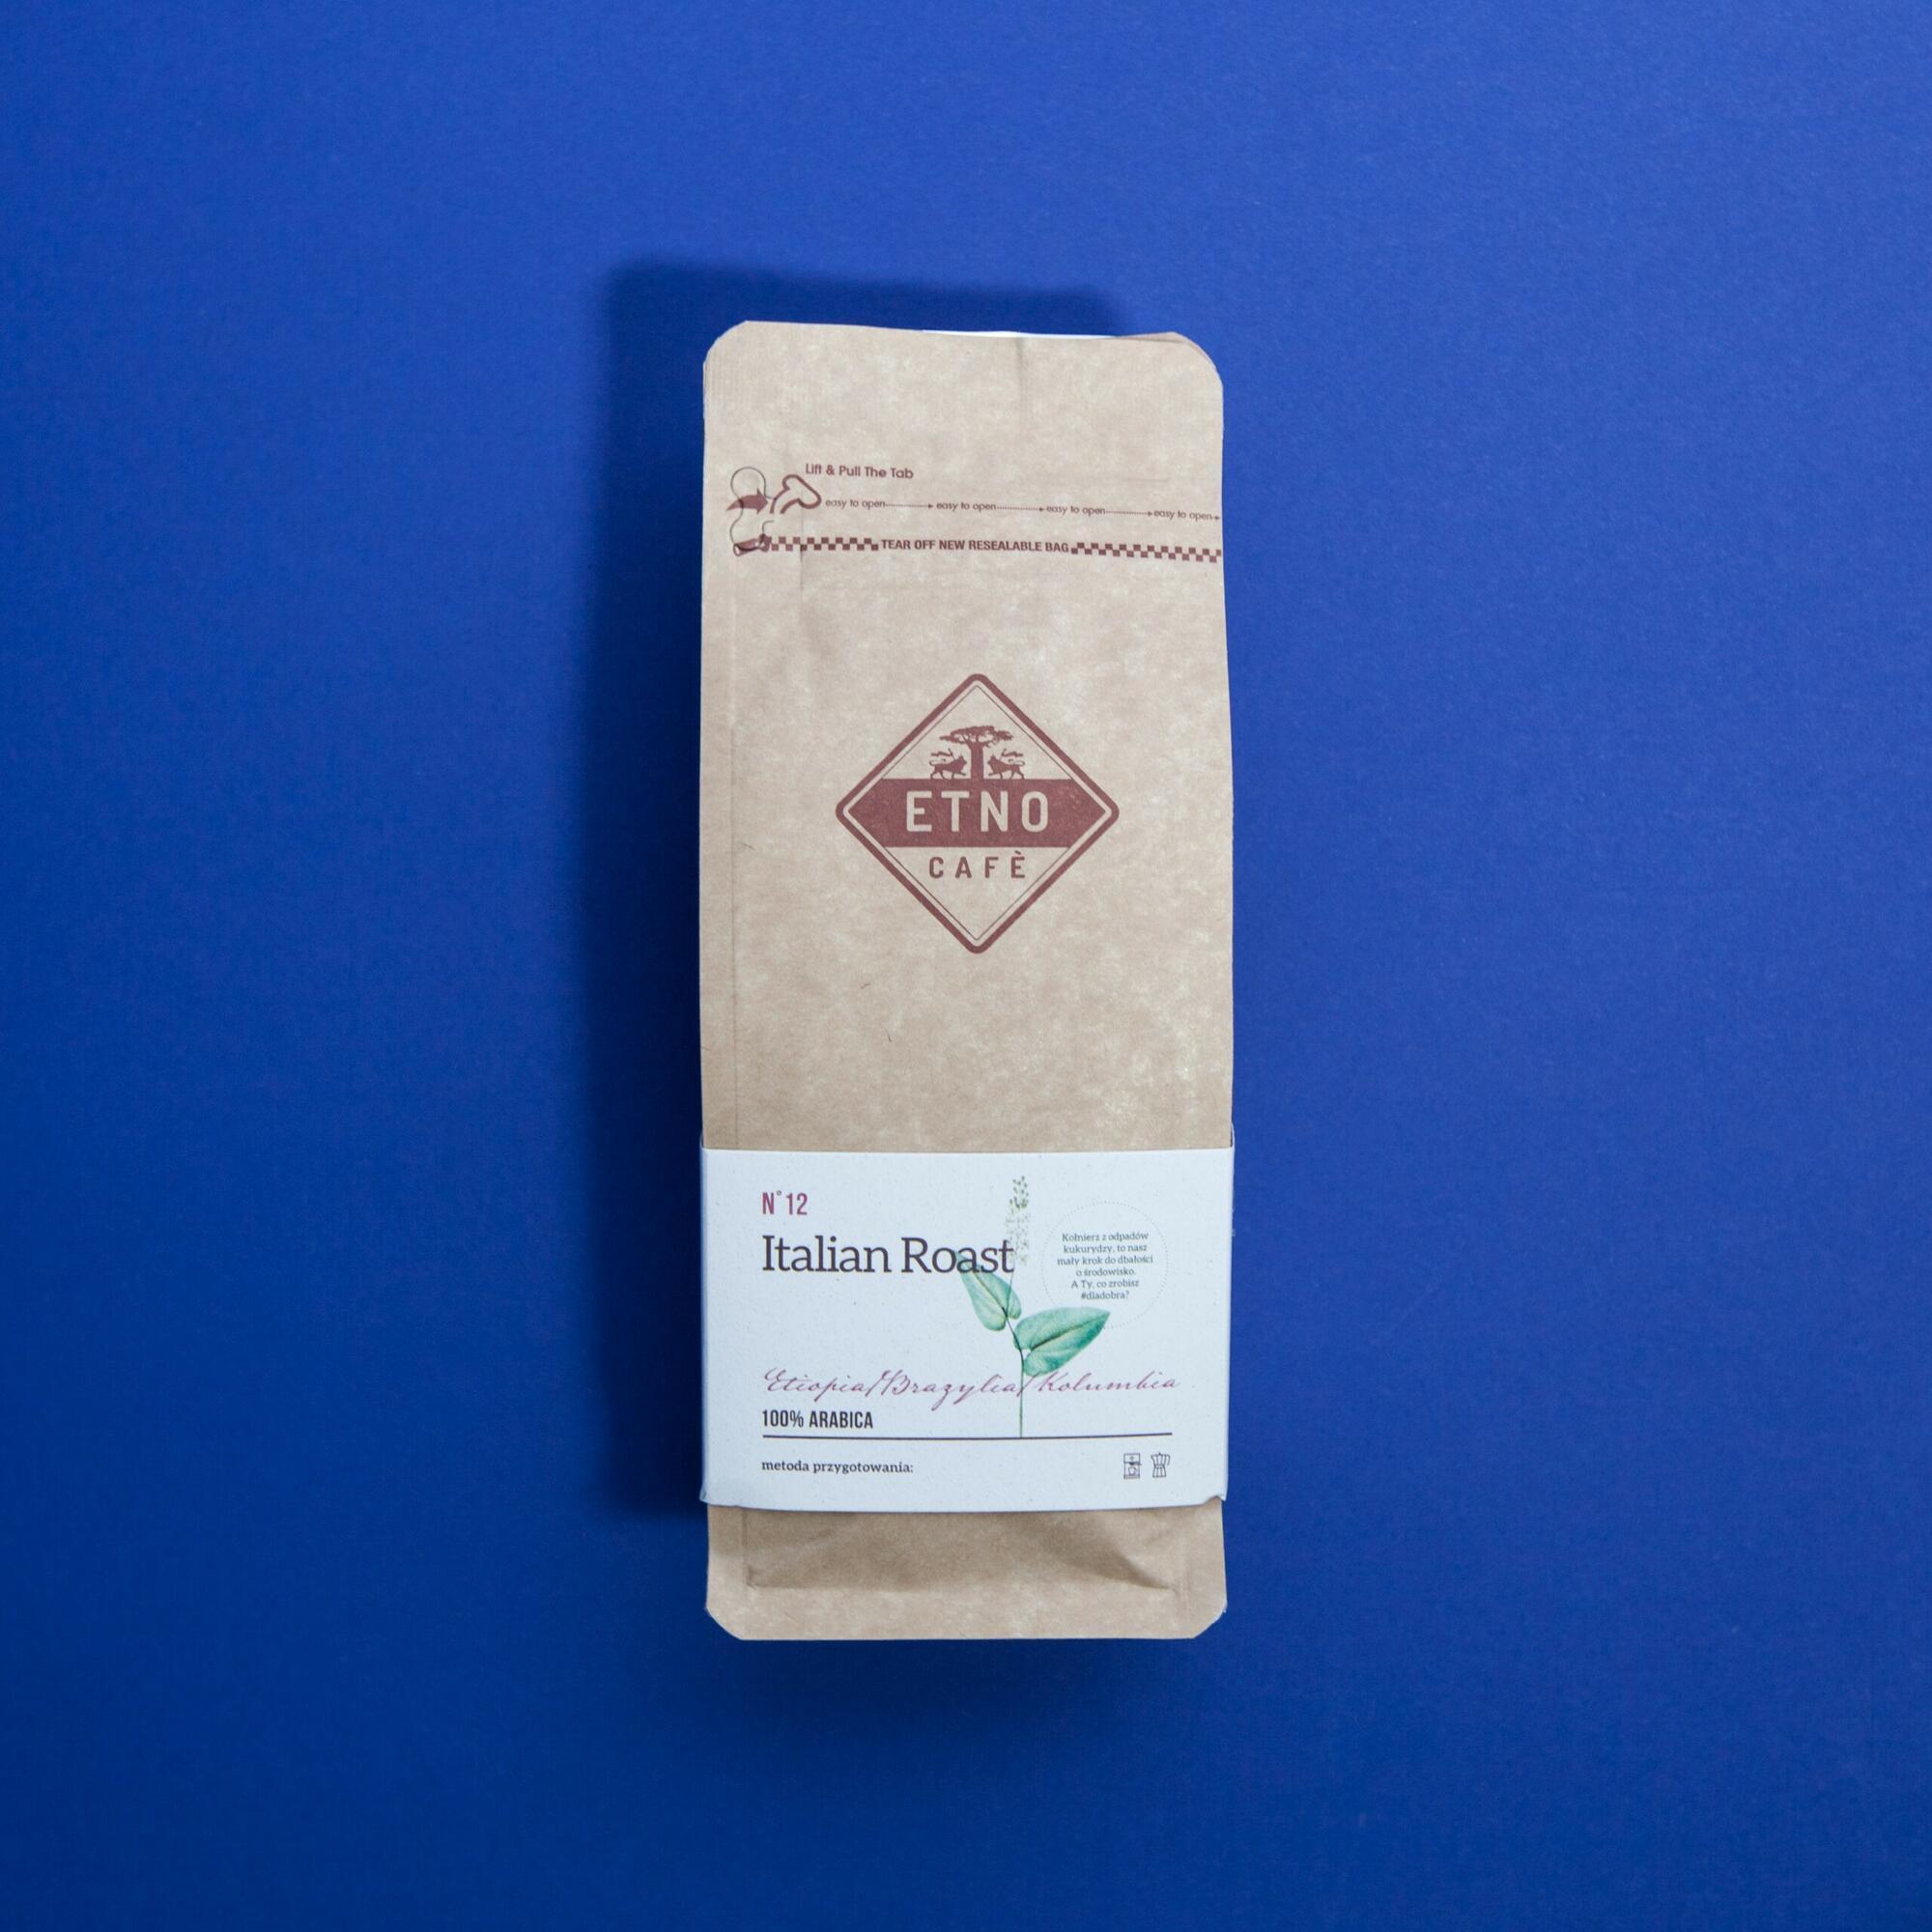 Etno cafe Italian Roast 250g - Coffee Gang | JestemSlow.pl